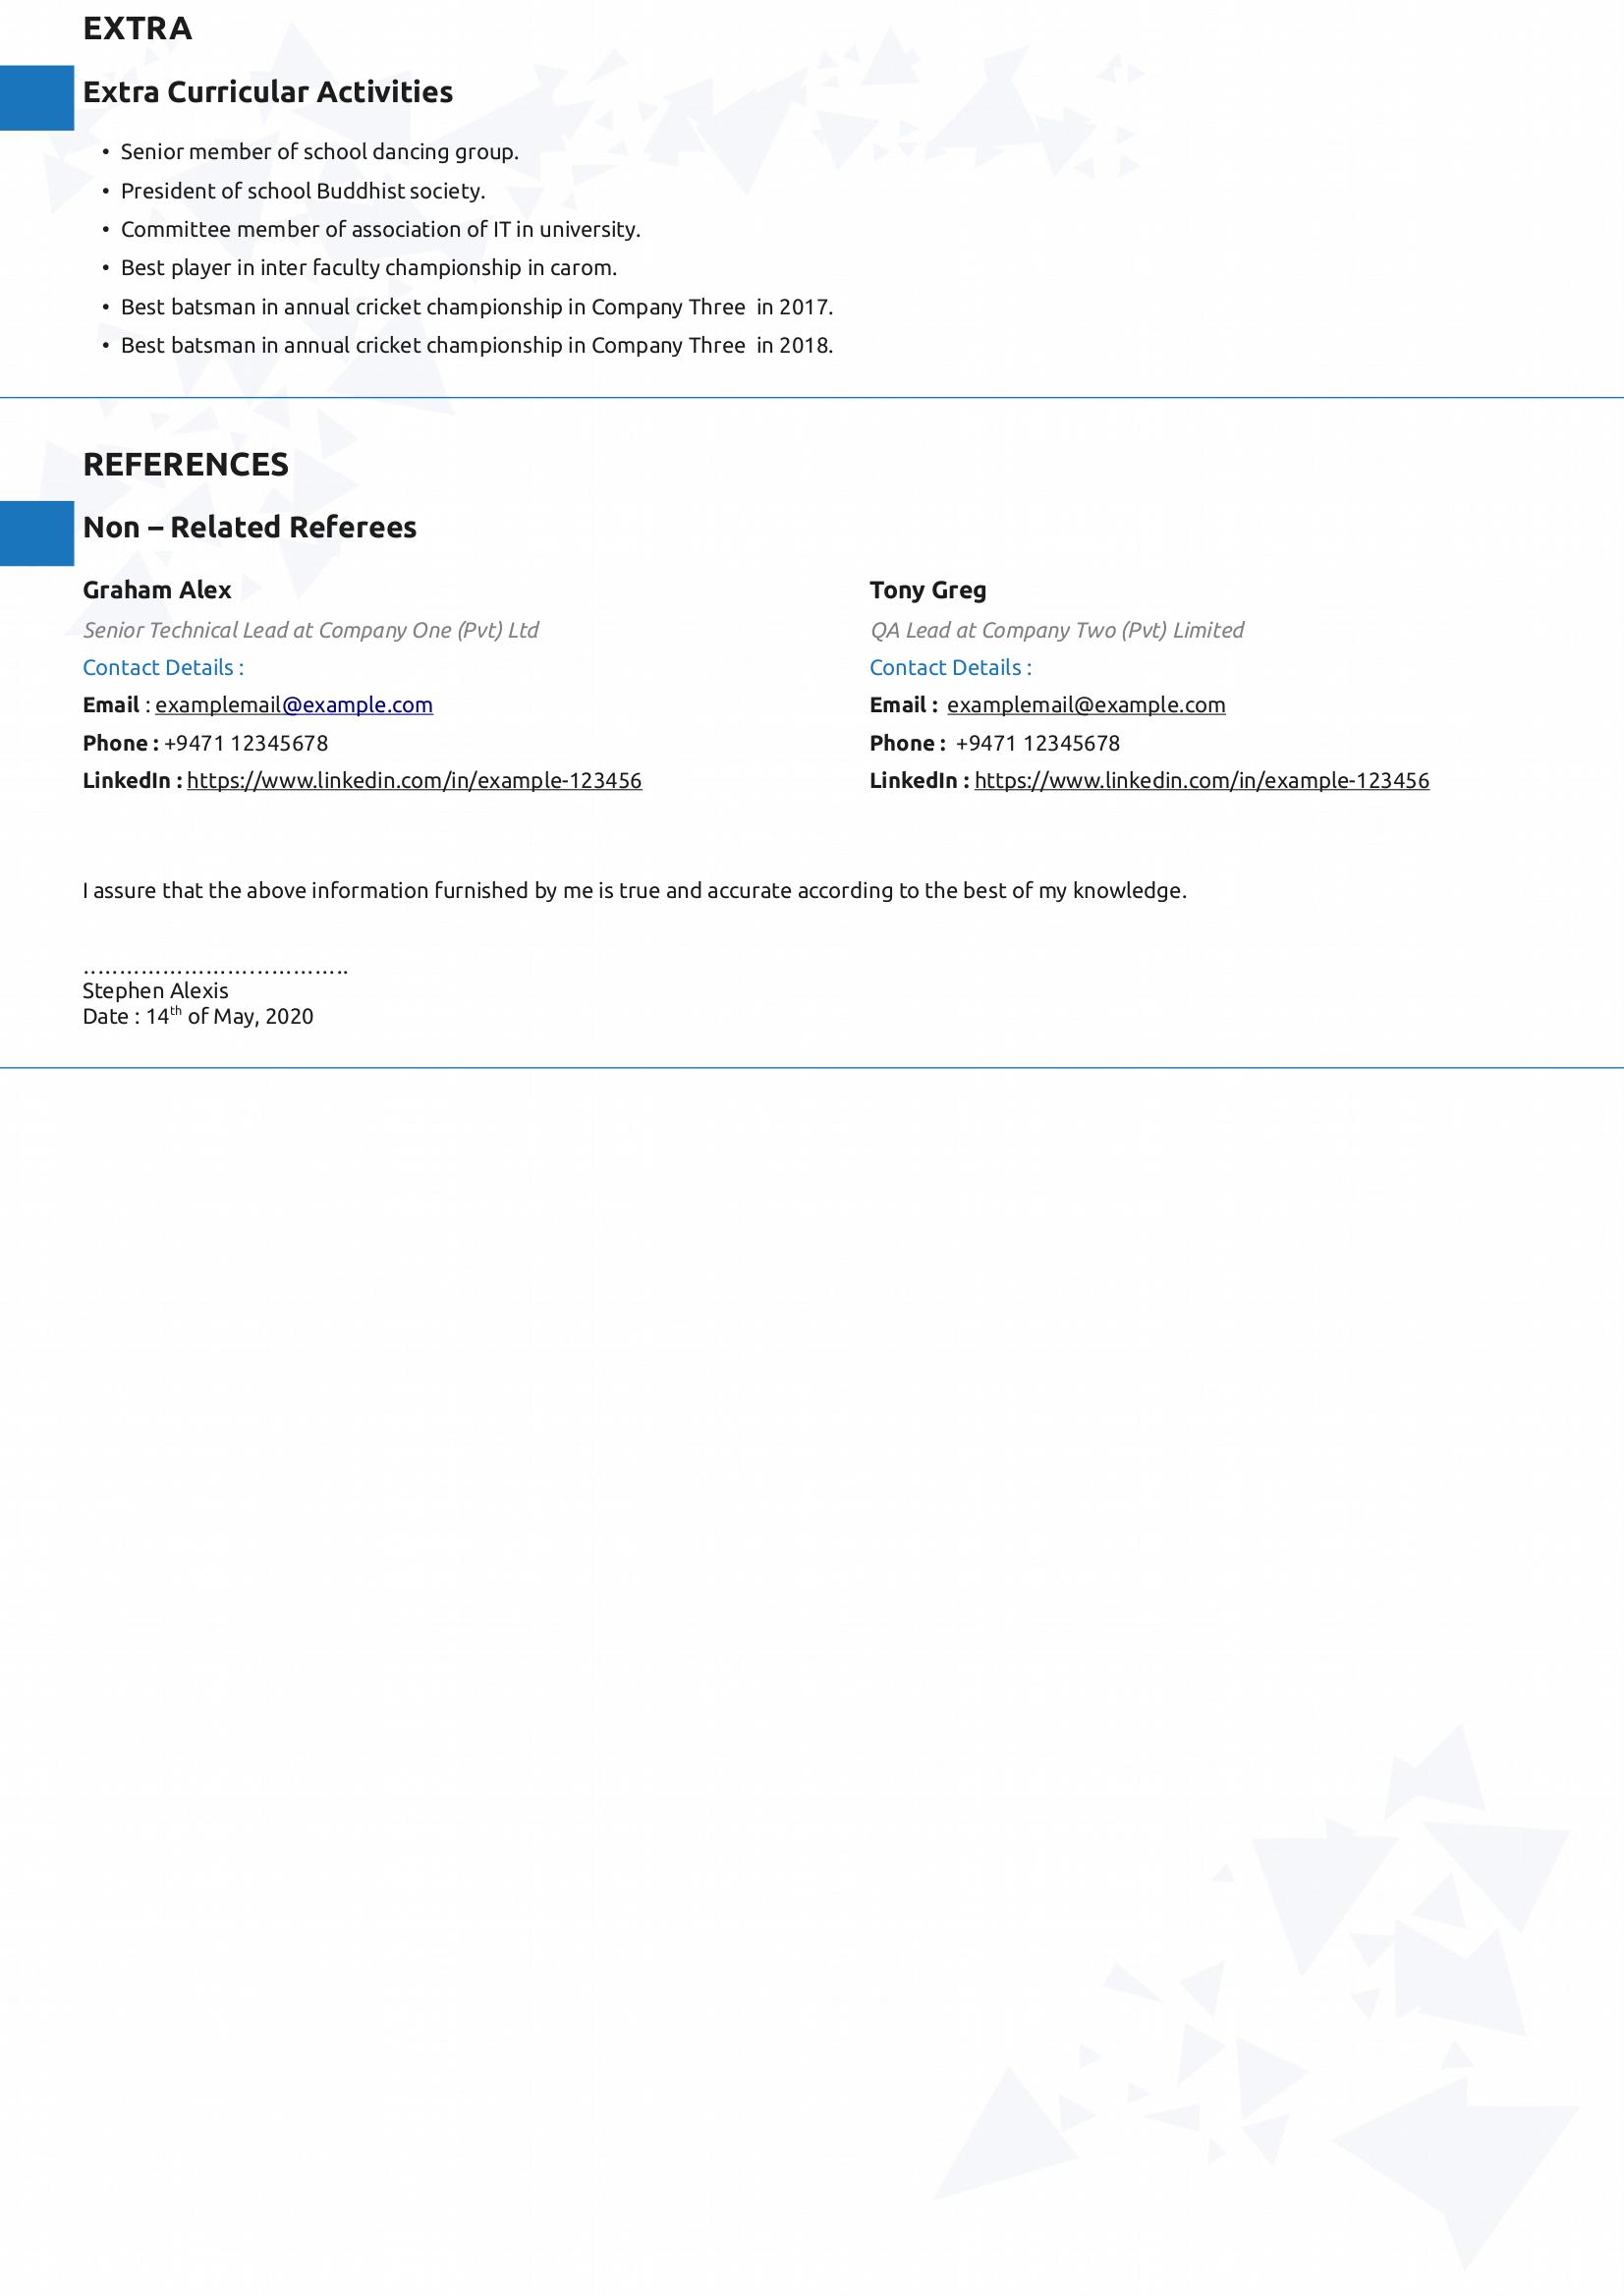 free download libreoffice writer resume  cv  templates style - 01